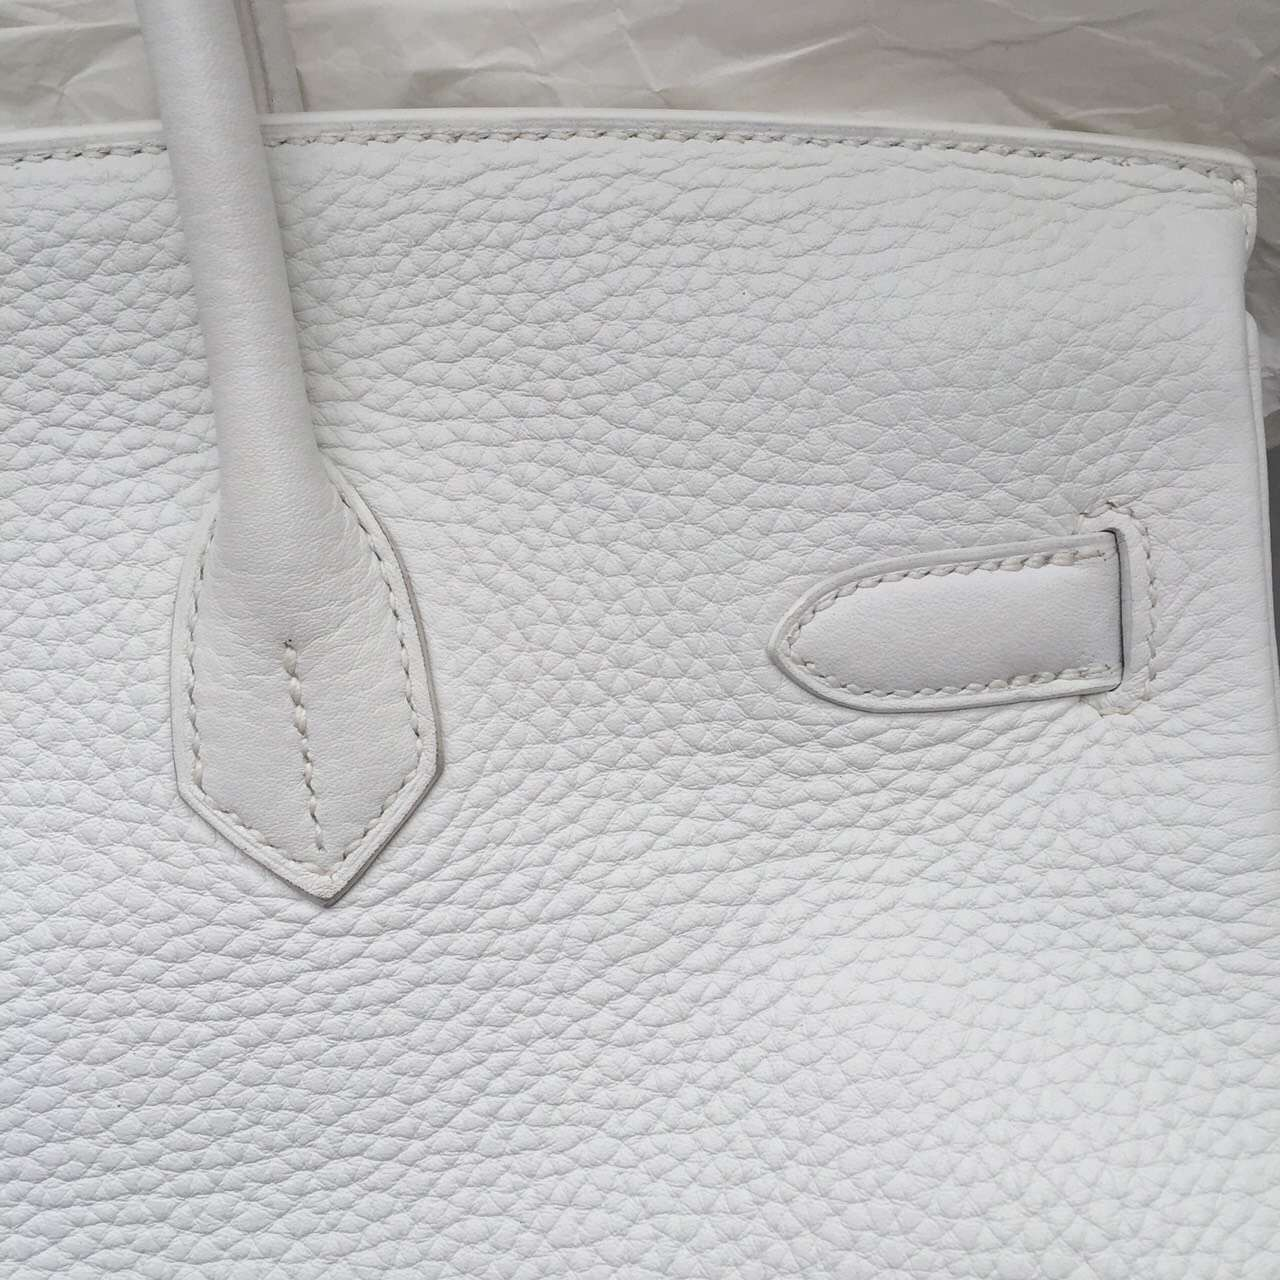 Wholesale White Togo Leather Hermes Birkin 35CM Luxury Ladies' Handbag